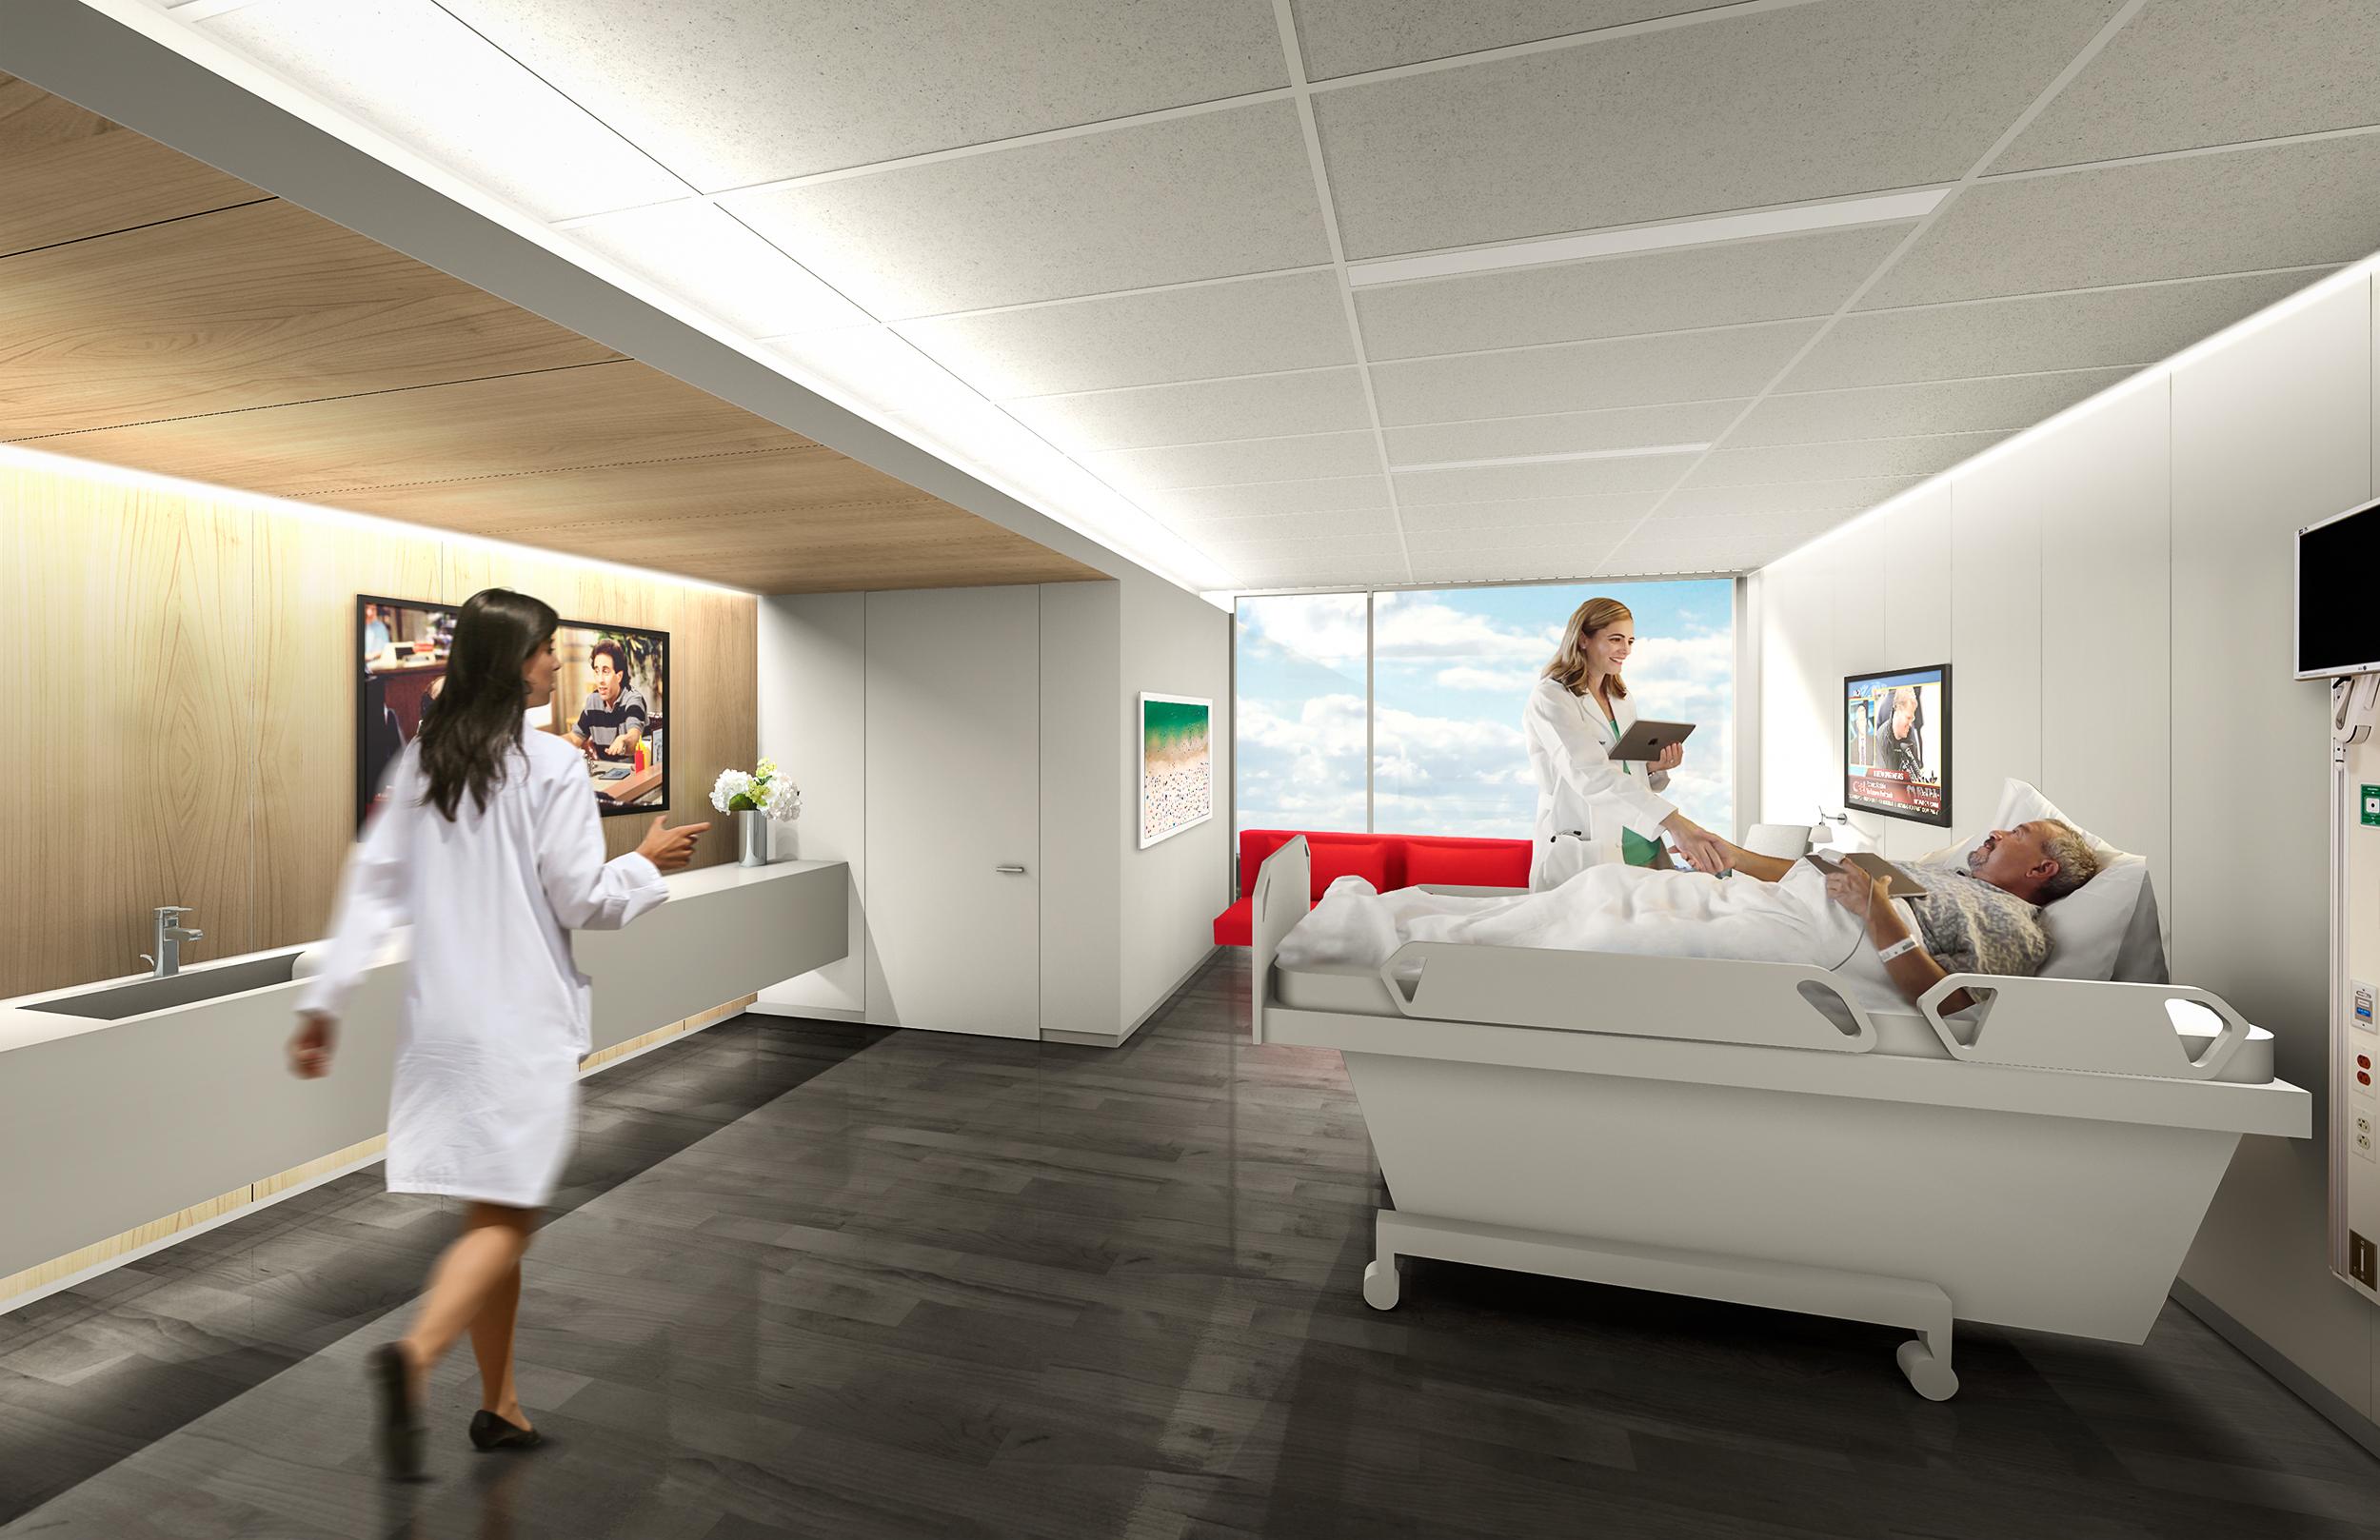 MUH_transplant_patient room.jpg